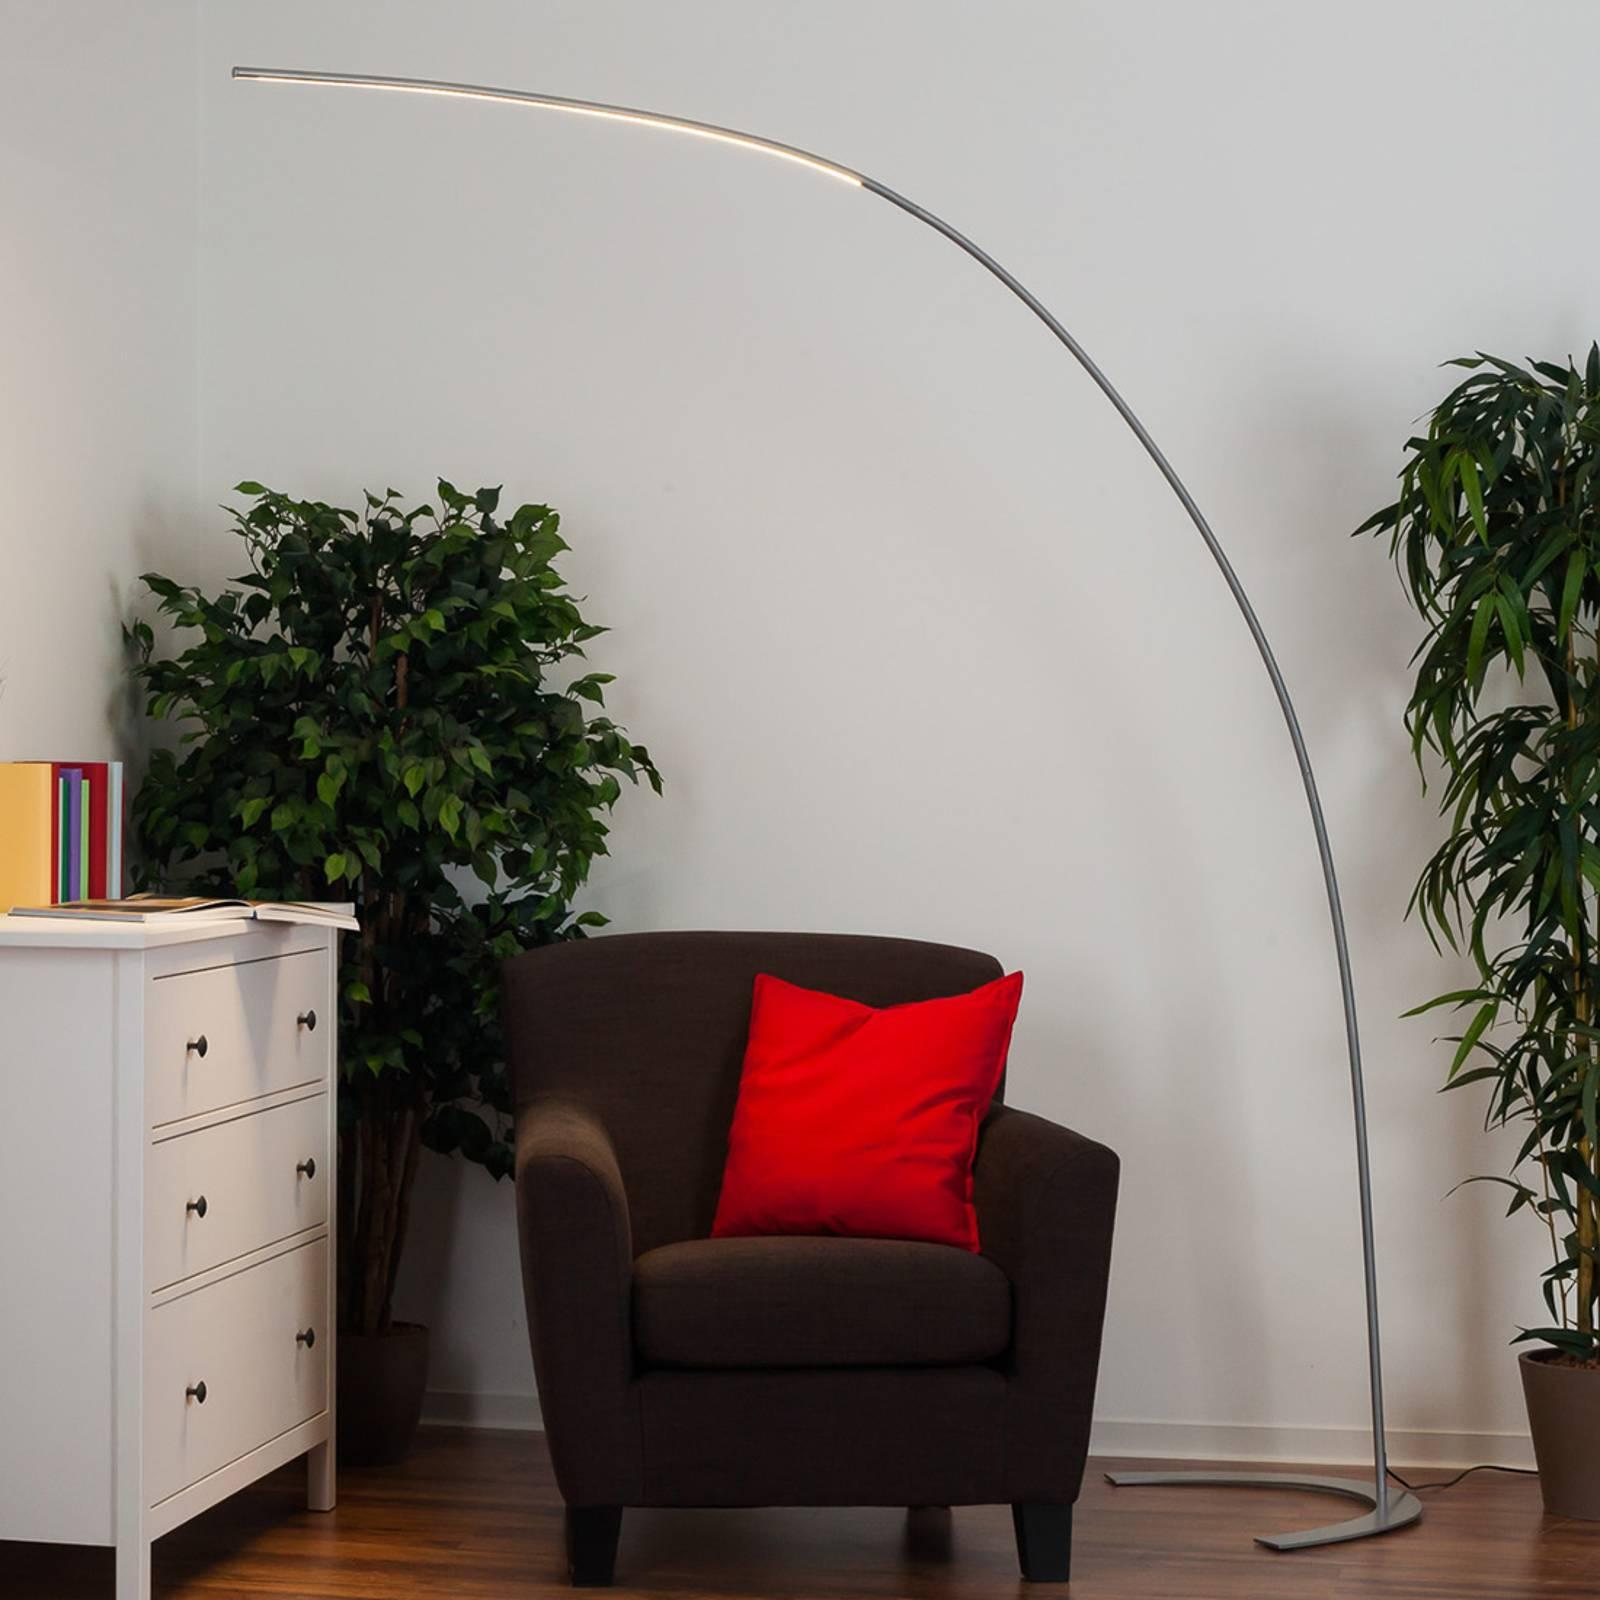 Silberne LED-Stehlampe Danua in Bogenform